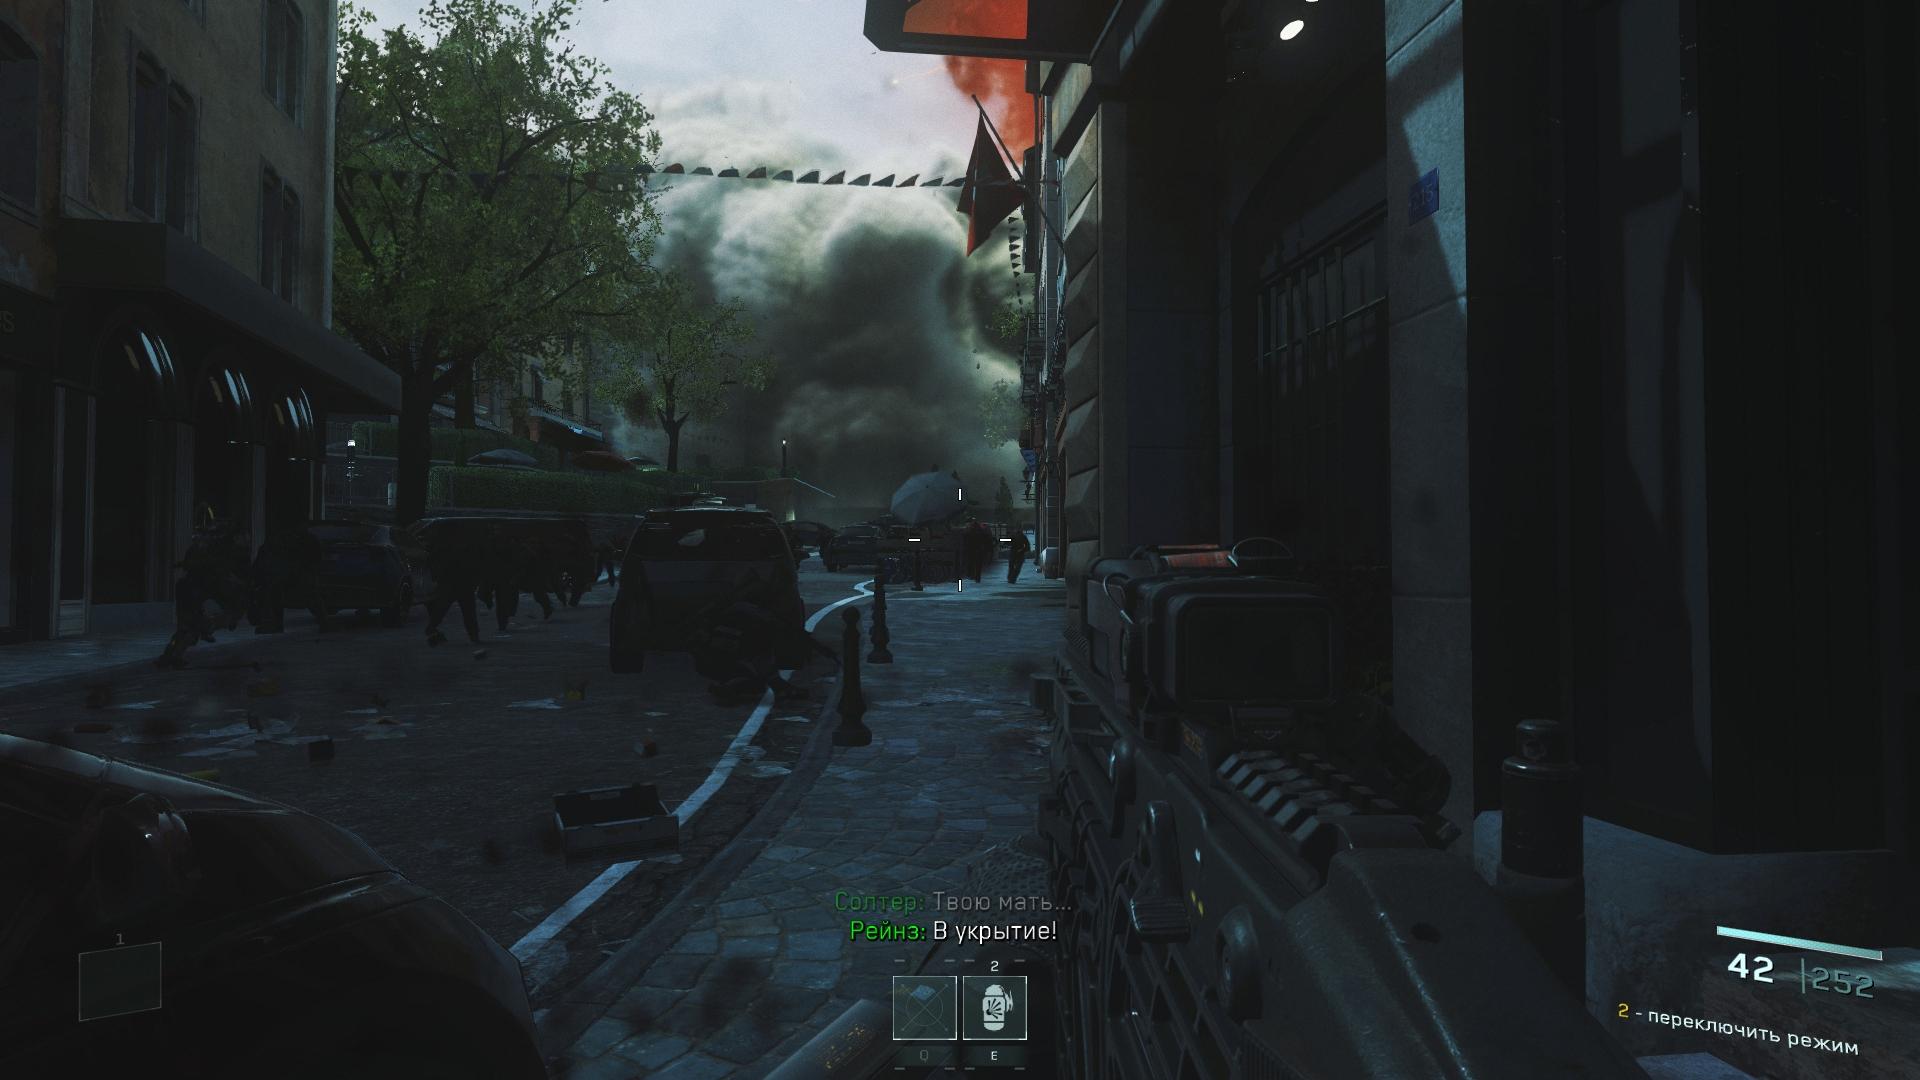 00021.Jpg - Call of Duty: Infinite Warfare